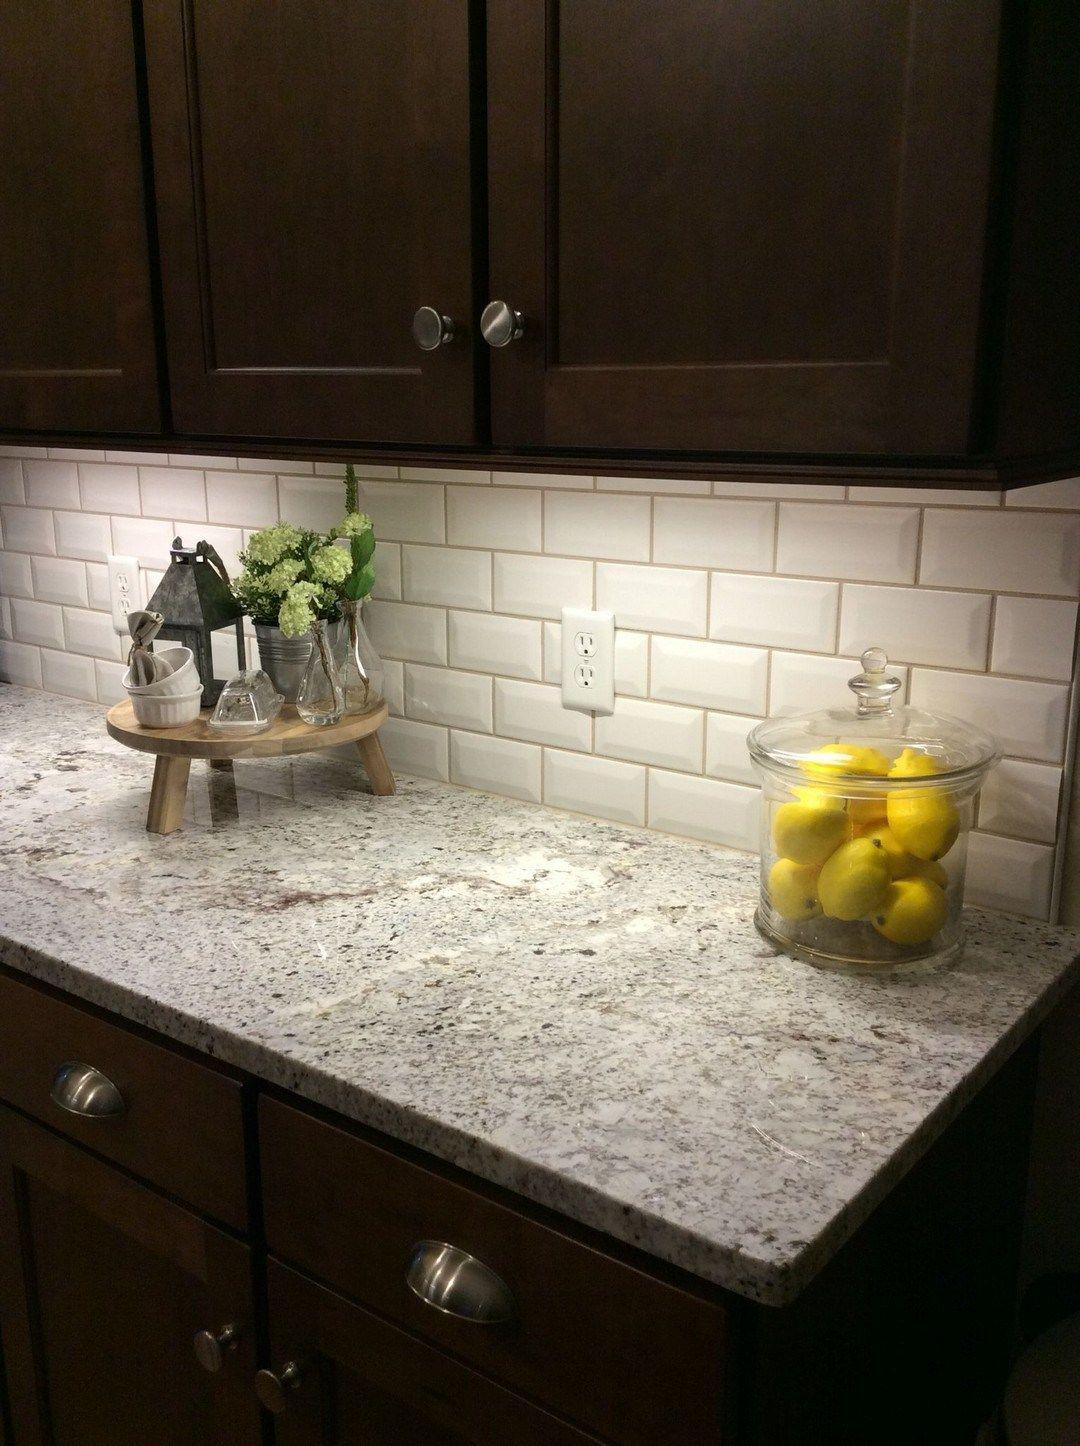 35 Gorgeous Kitchen Backsplash Ideas With Granite (13 ... on Backsplash With Dark Granite  id=67593